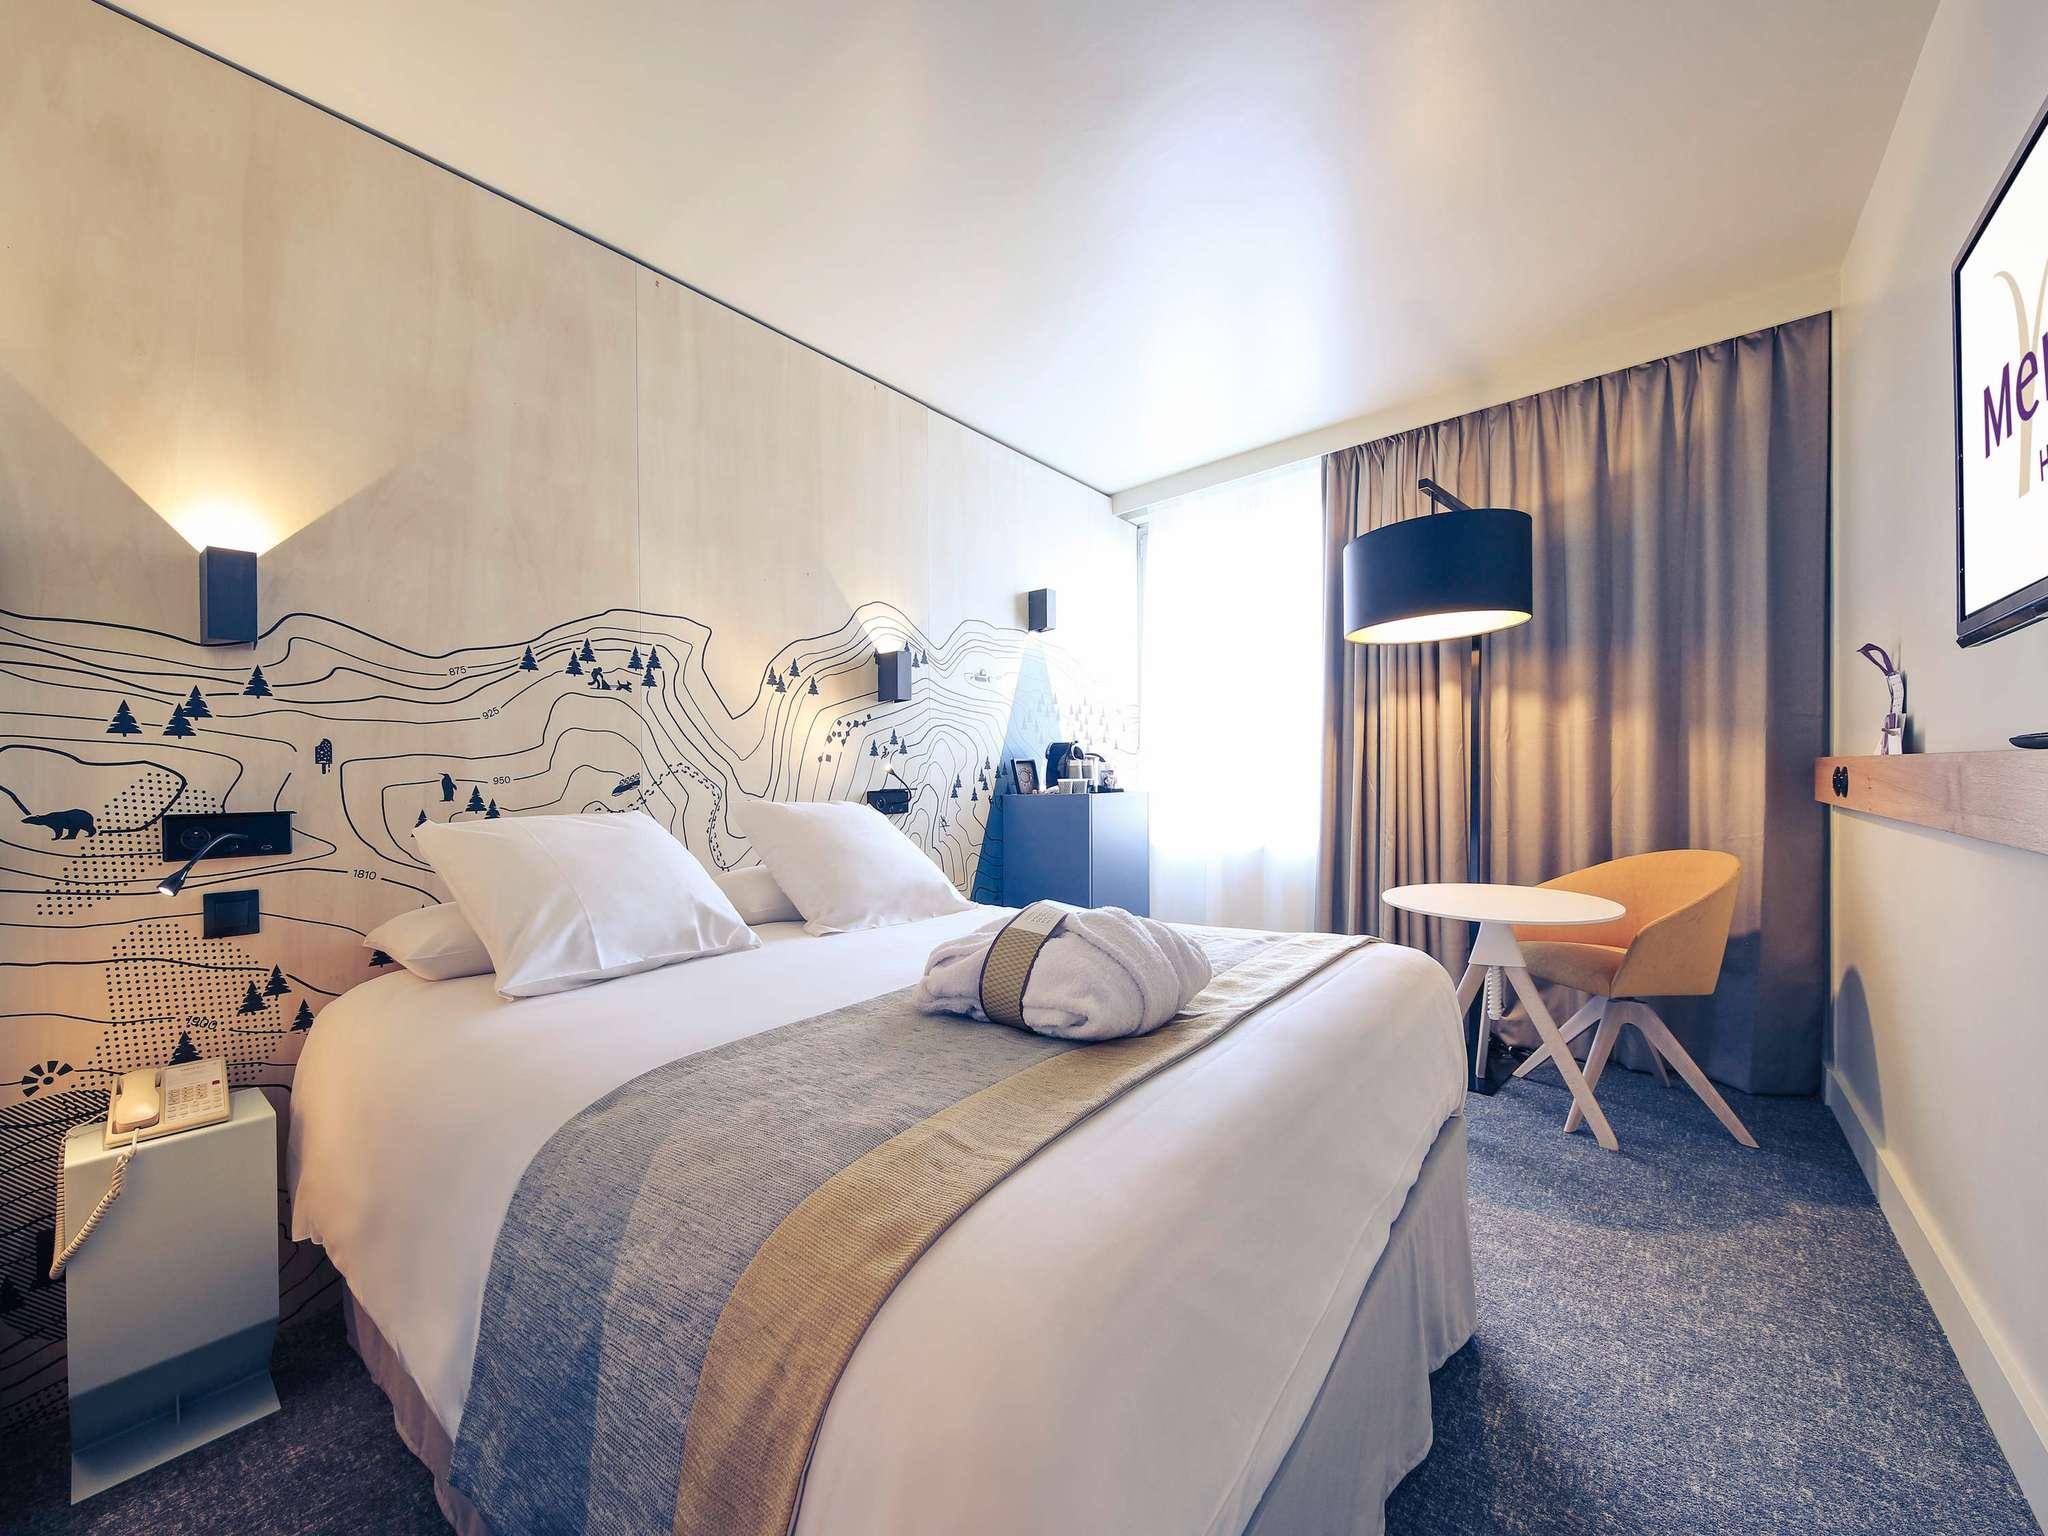 Hôtel - Hôtel Mercure Grenoble Centre Alpotel